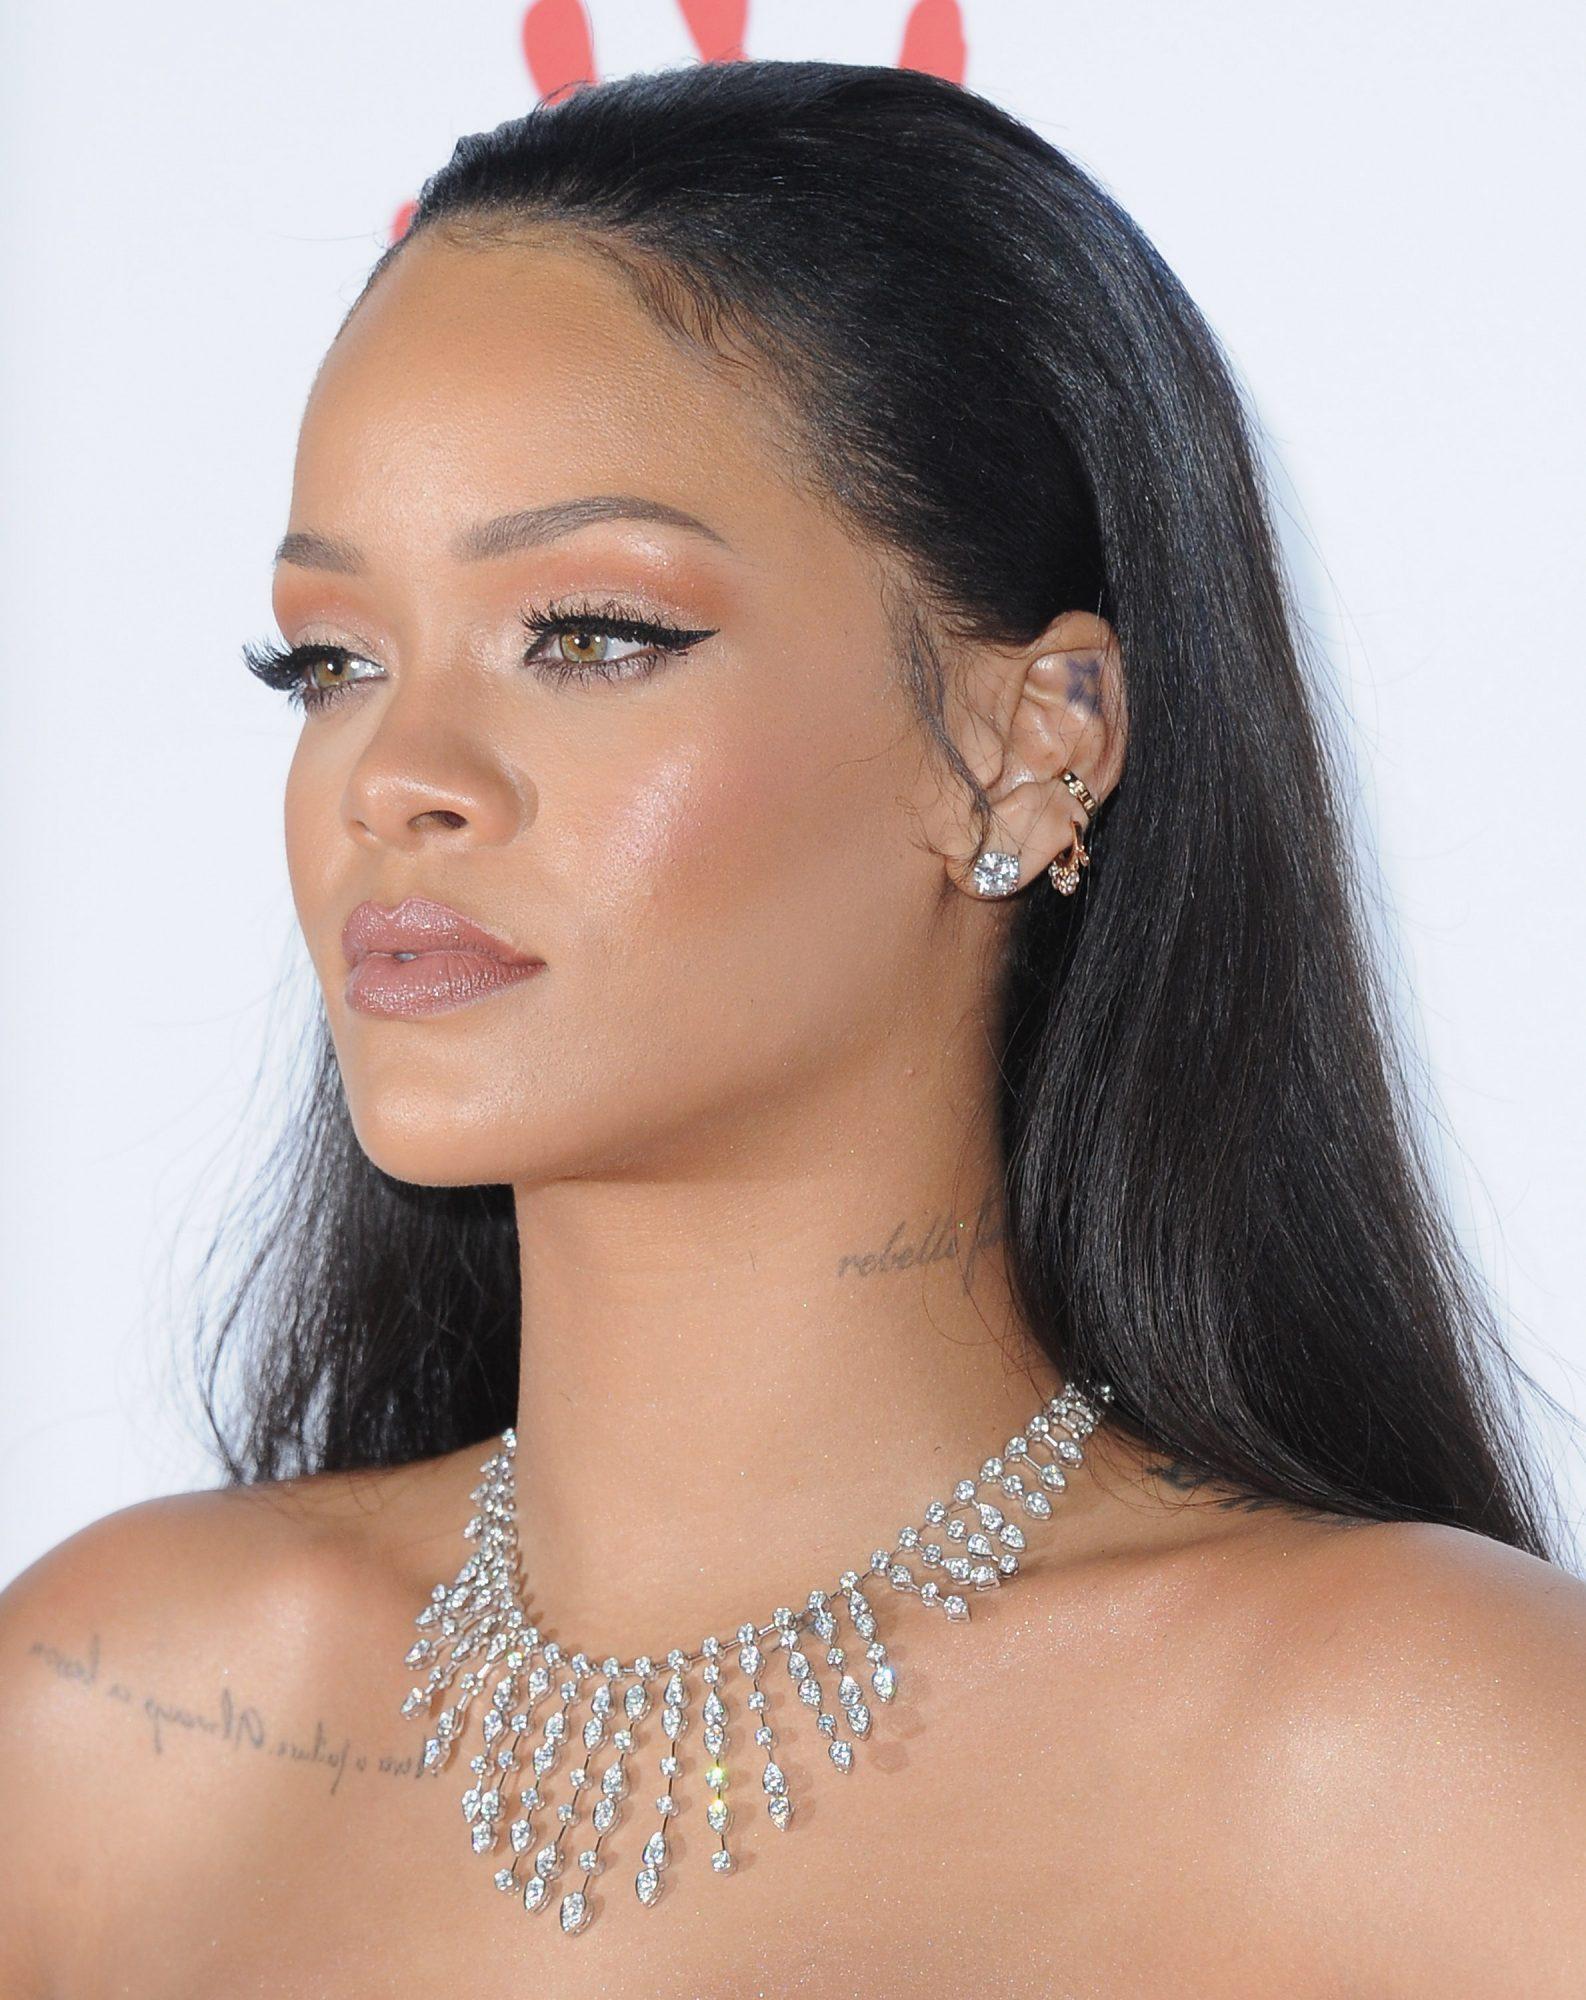 Rihanna conch piercing